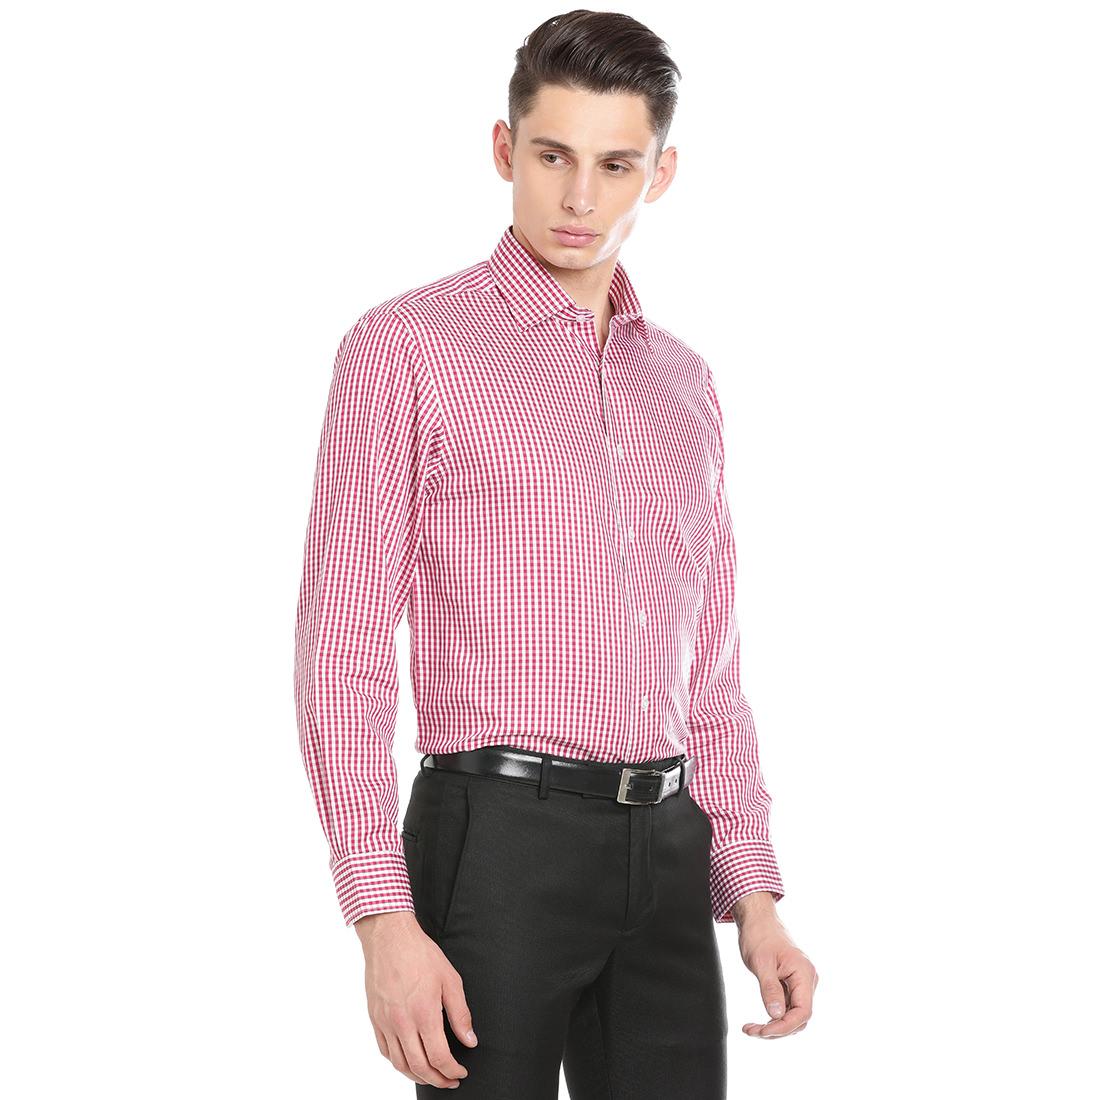 Paradigm Pink Color Formal Pure Cotton Non-Iron Shirt